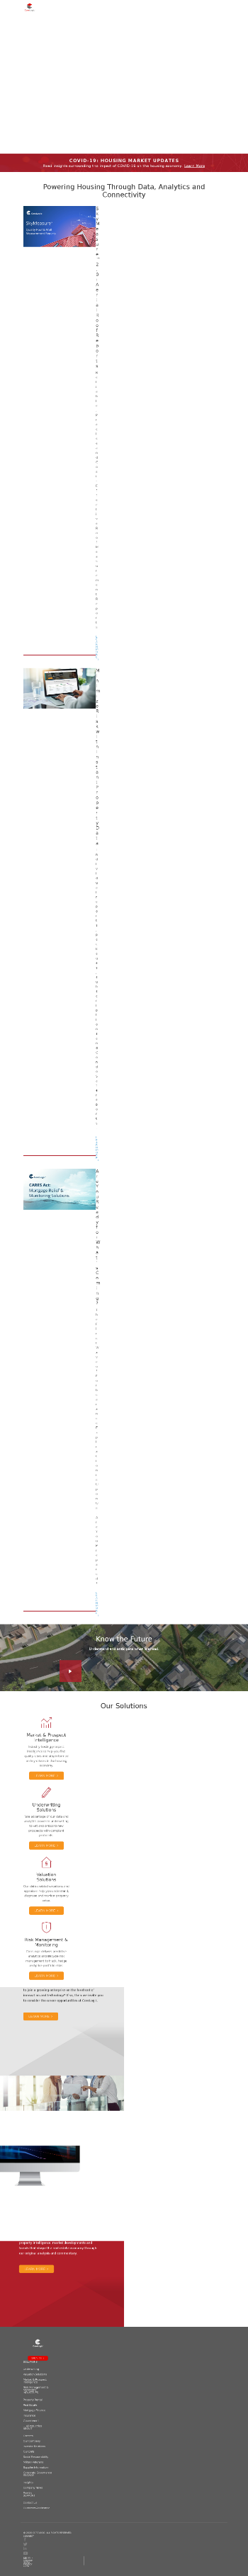 CoreLogic, Inc. Website Screenshot